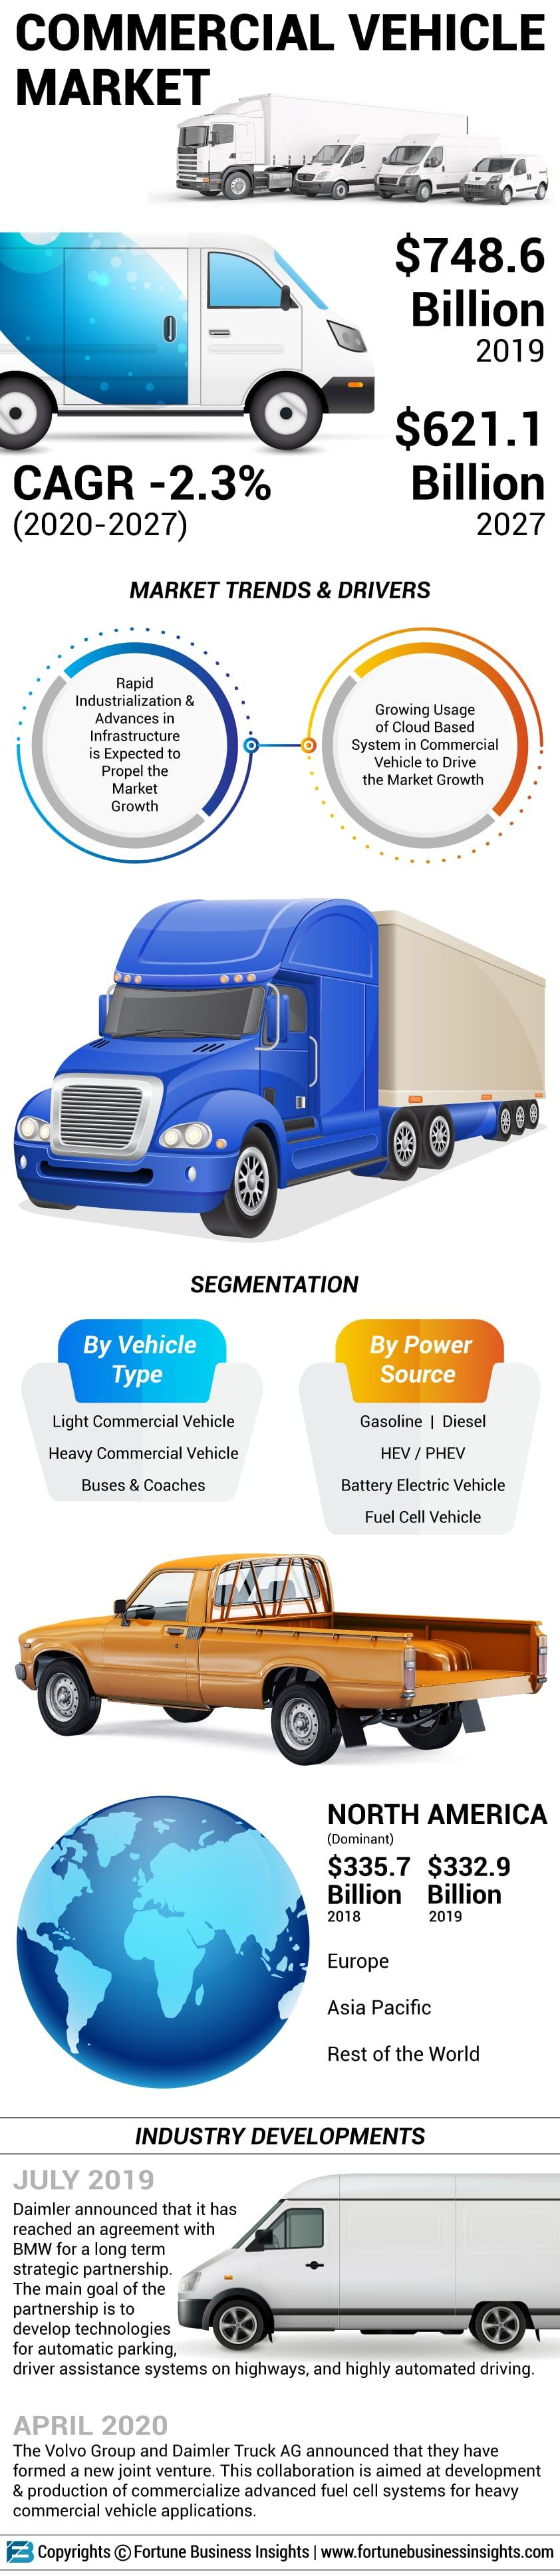 Commercial Vehicle Market